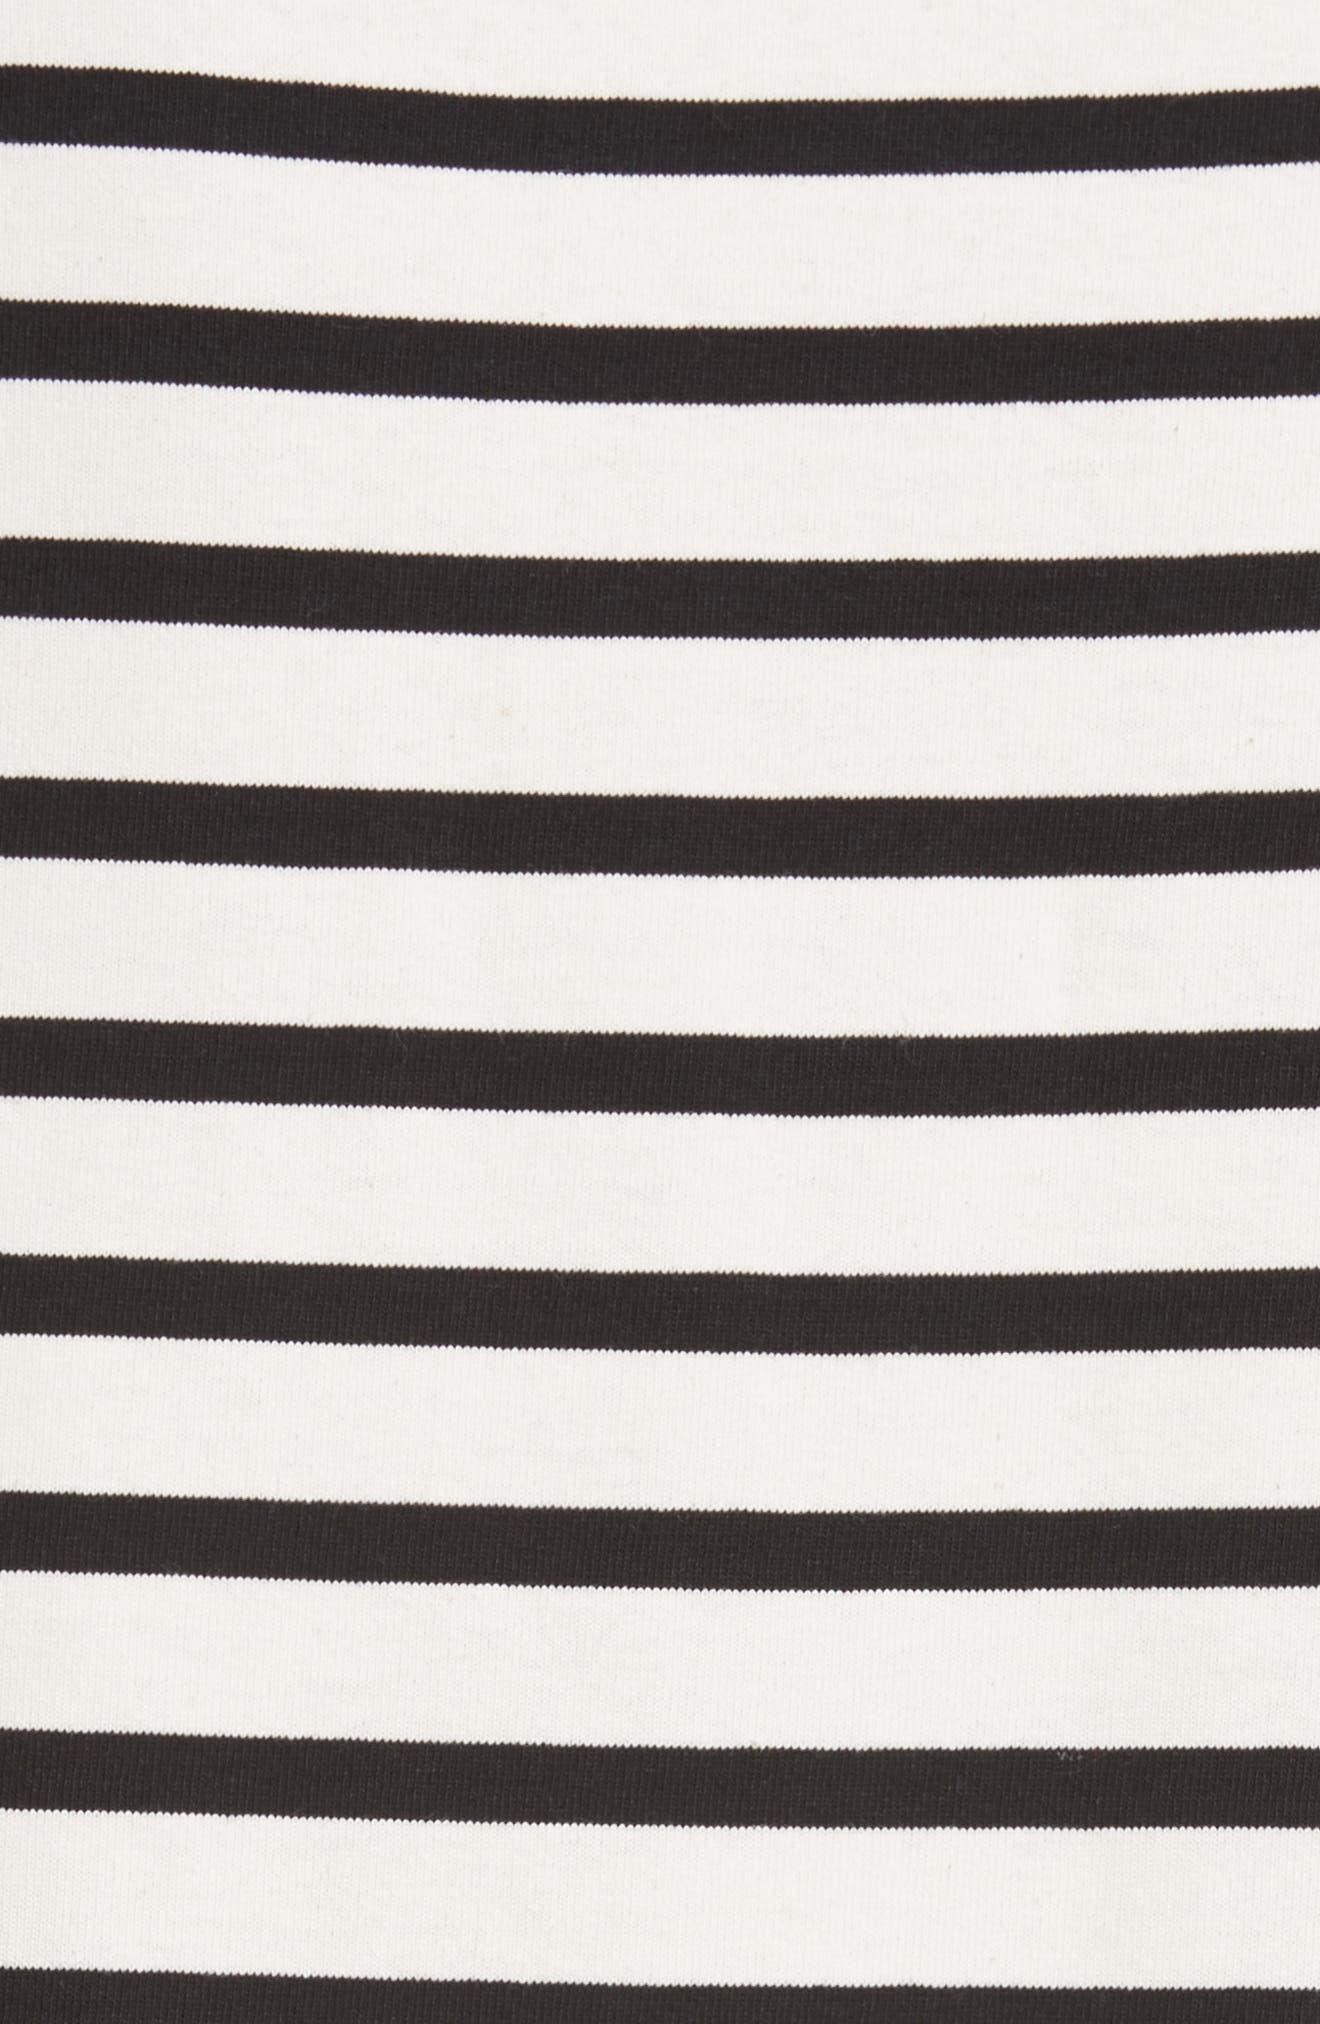 Pompom Stripe Drop Waist Dress,                             Alternate thumbnail 6, color,                             Ecru/ Black